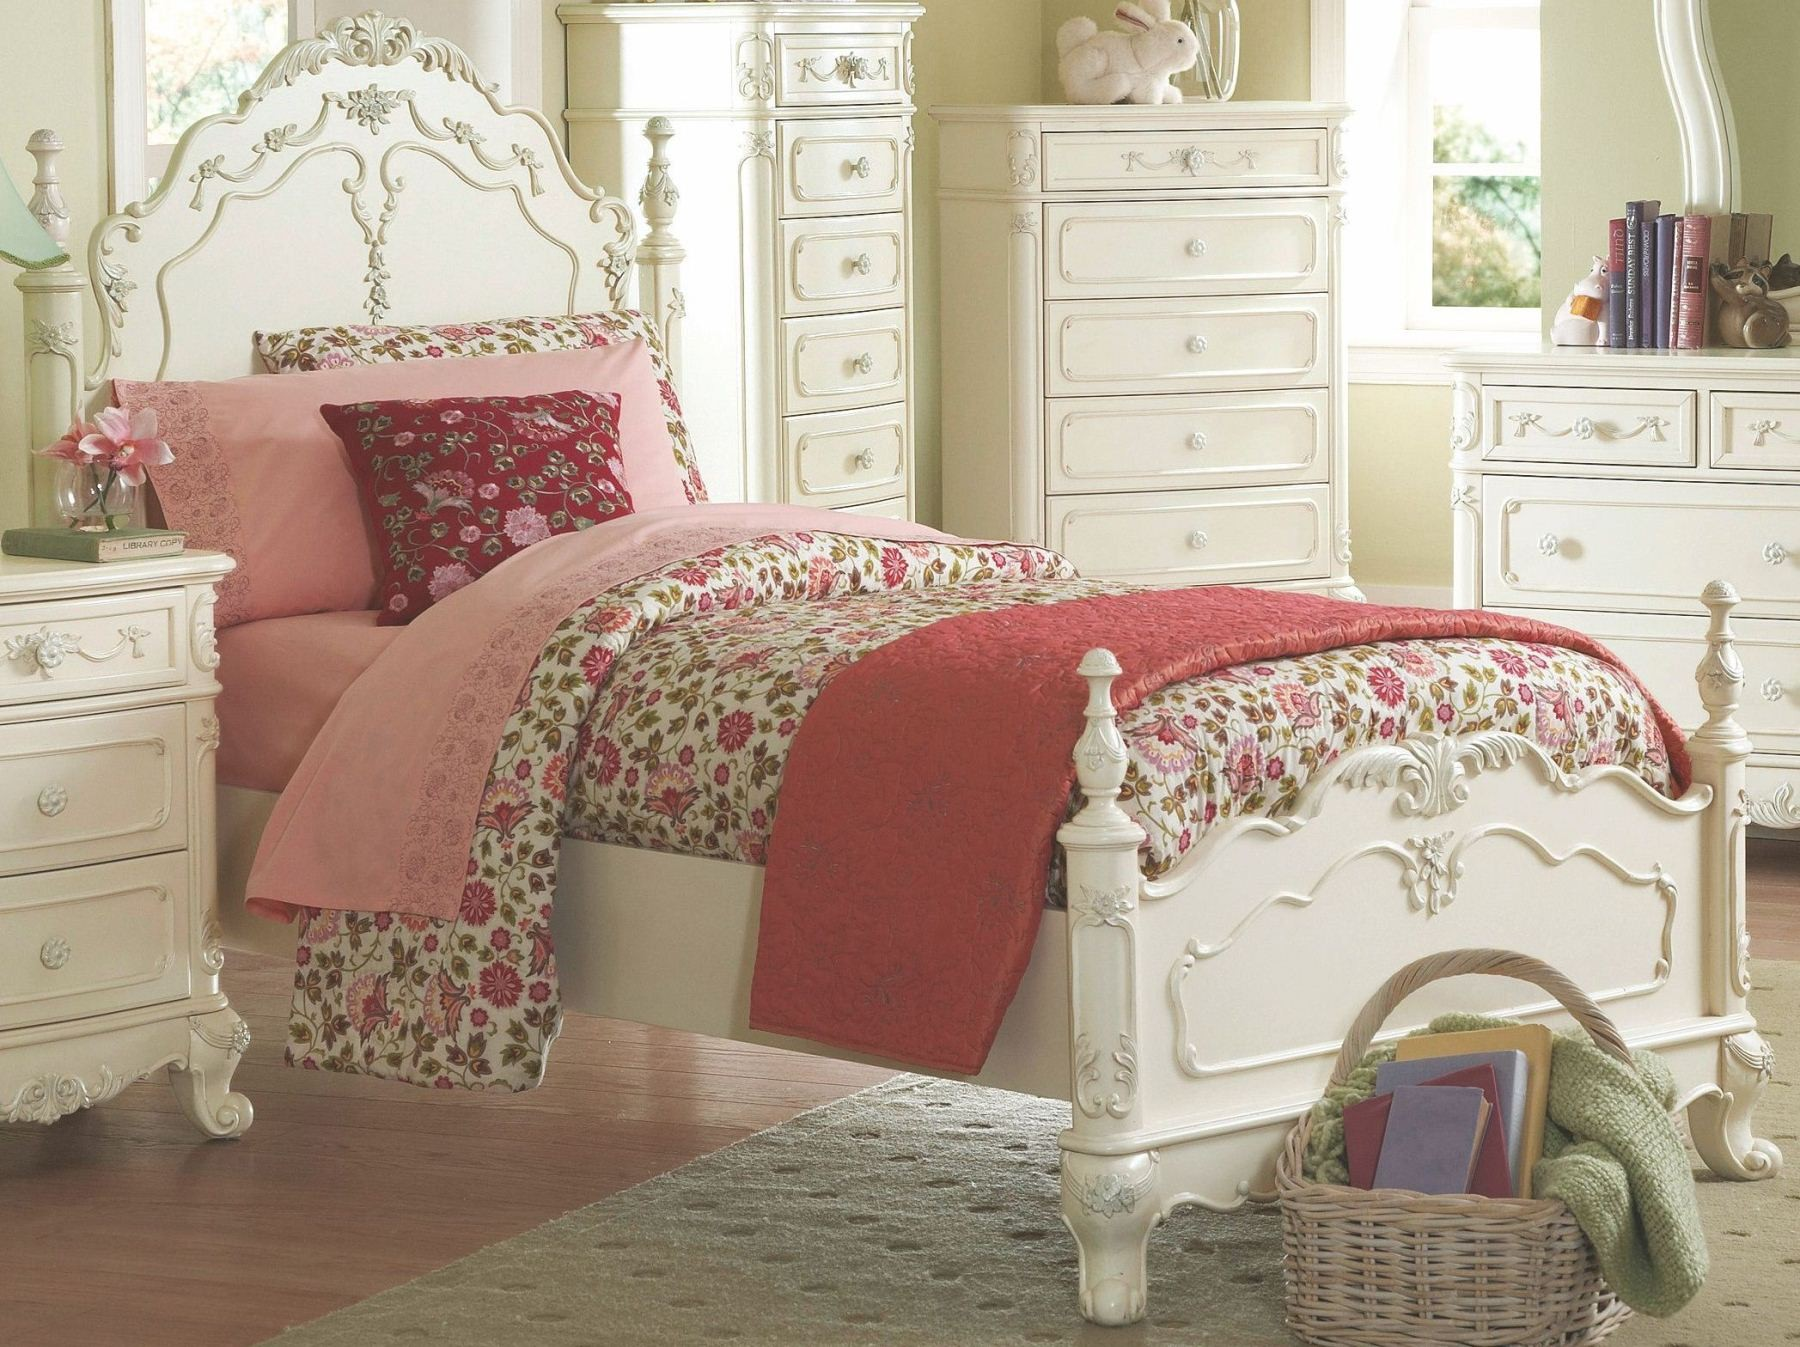 332409. Cinderella Youth Bedroom Set from Homelegance  1386    Coleman